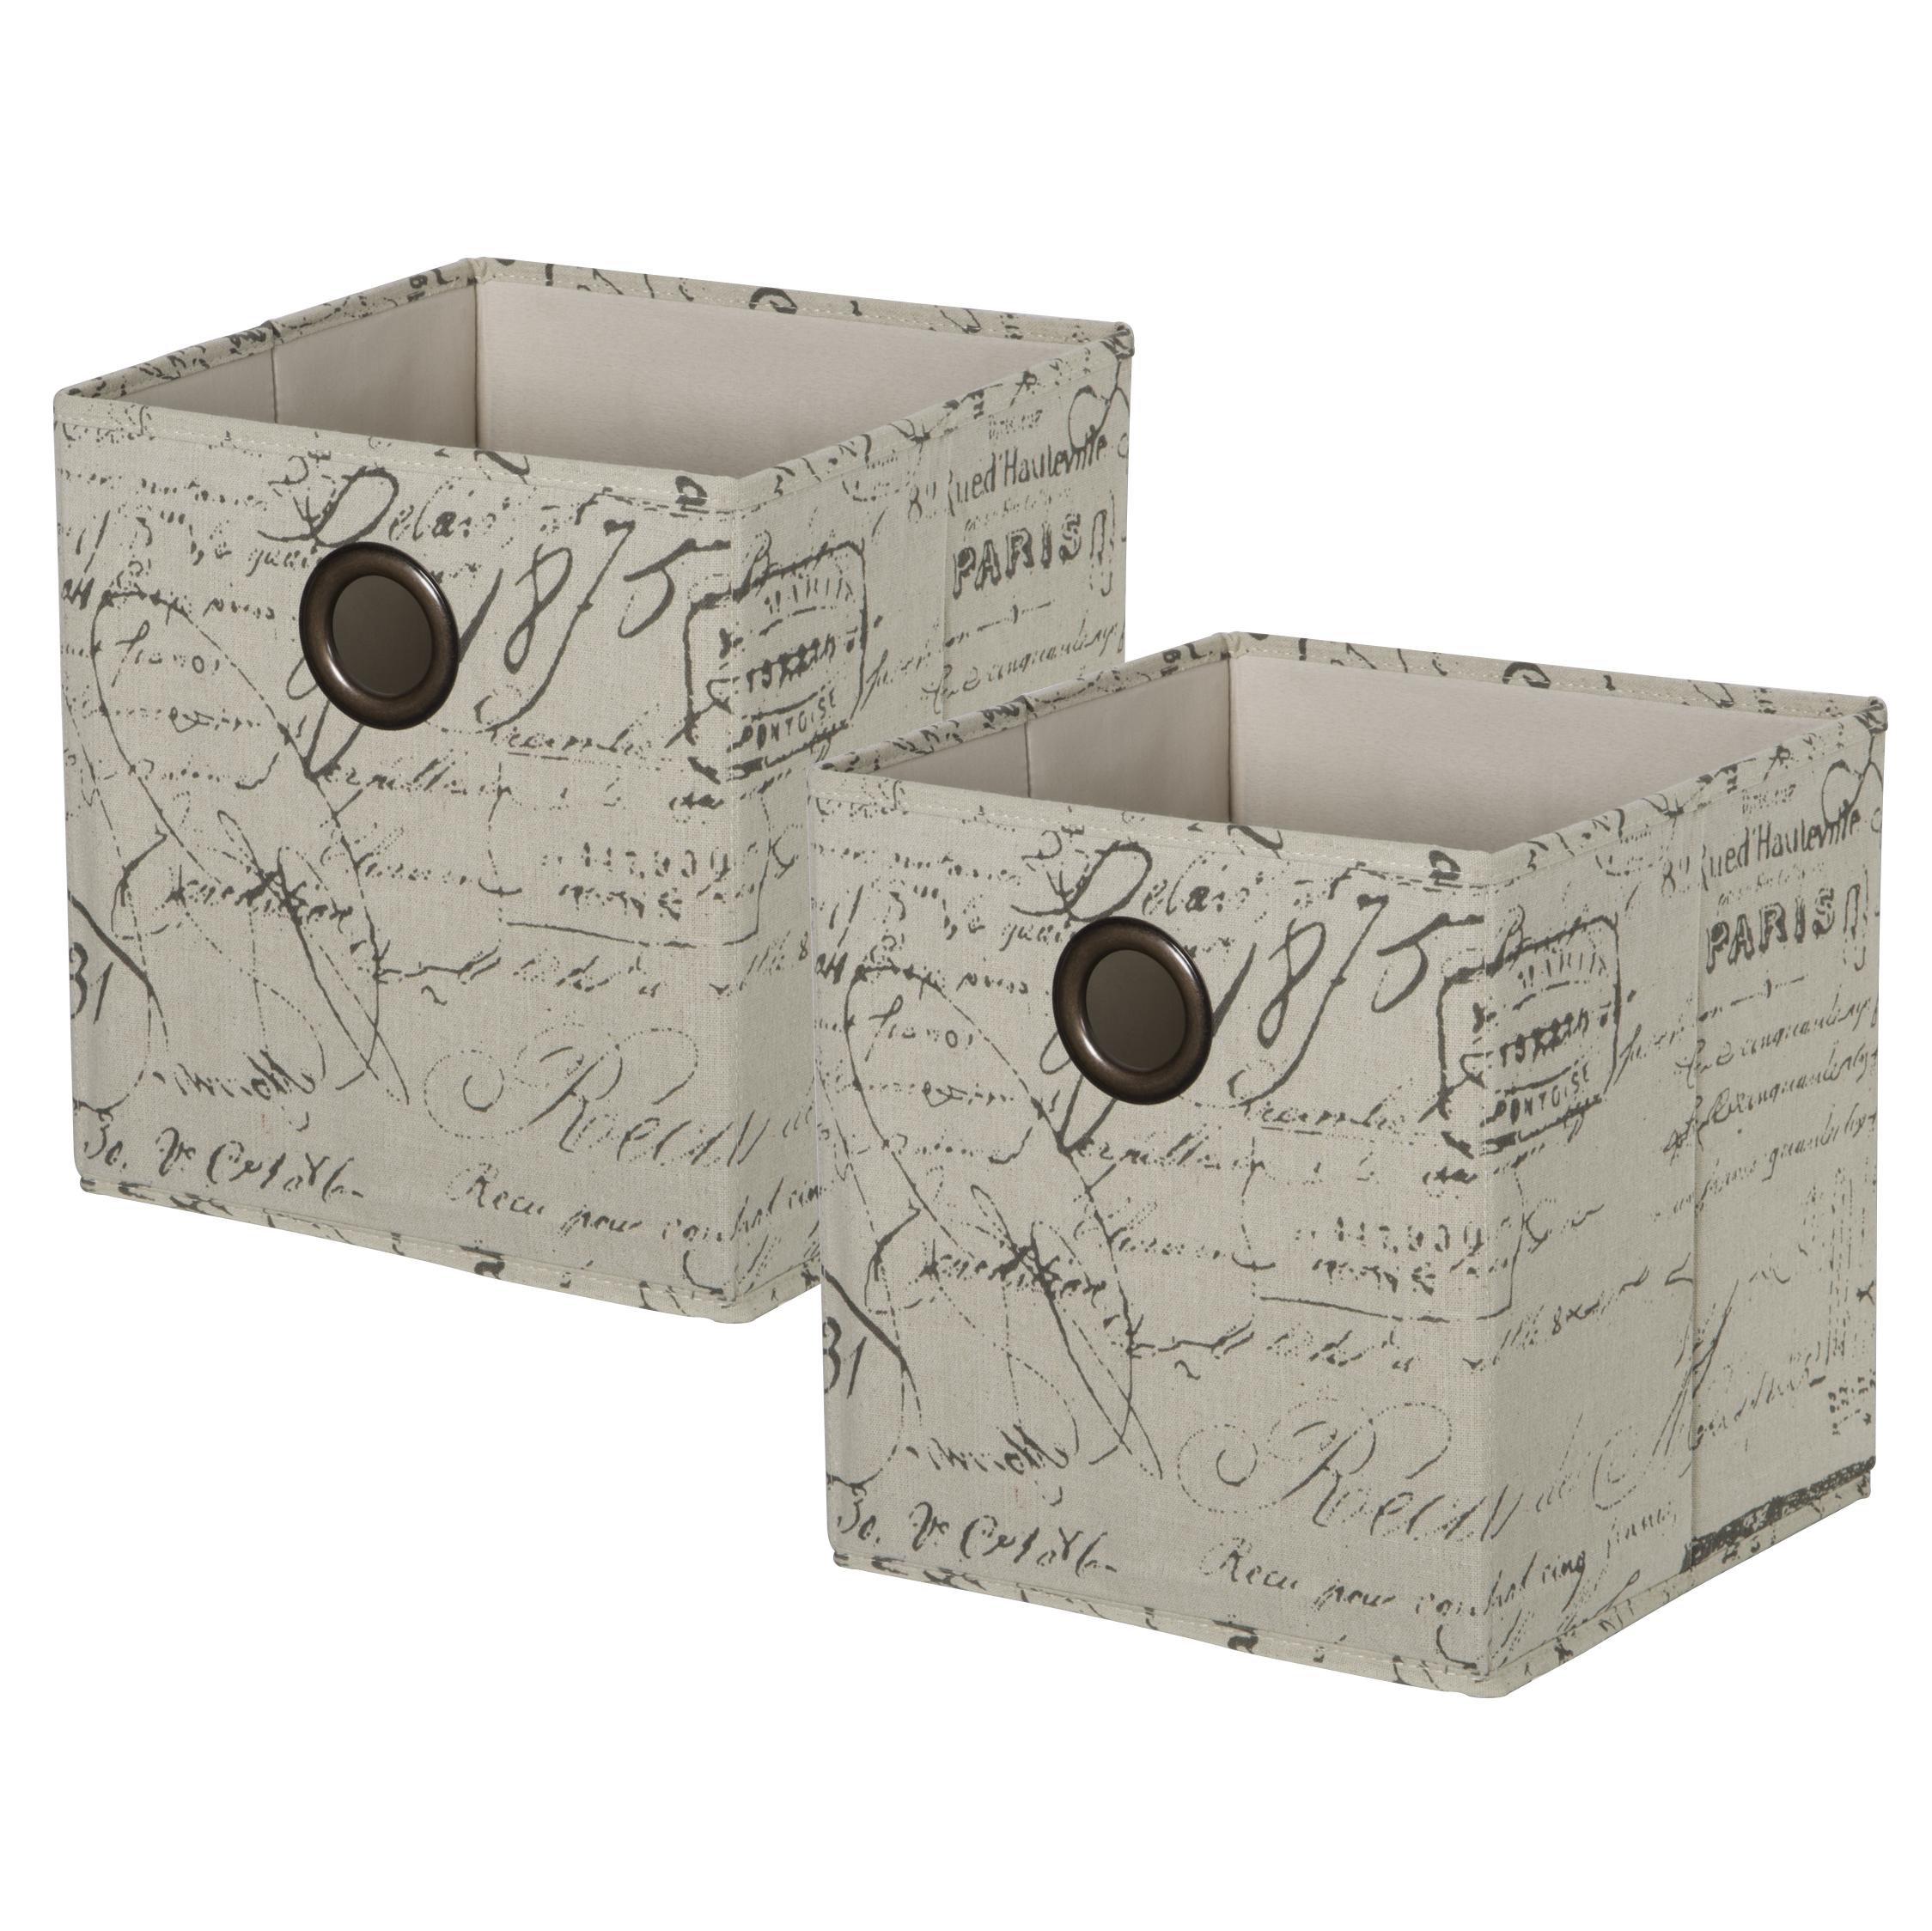 Set of 2 KD Cubes - ScriptItem #86101002 - Script KD cubes with metal grommet handles. Fold flat when not in use.Dimensions: 11